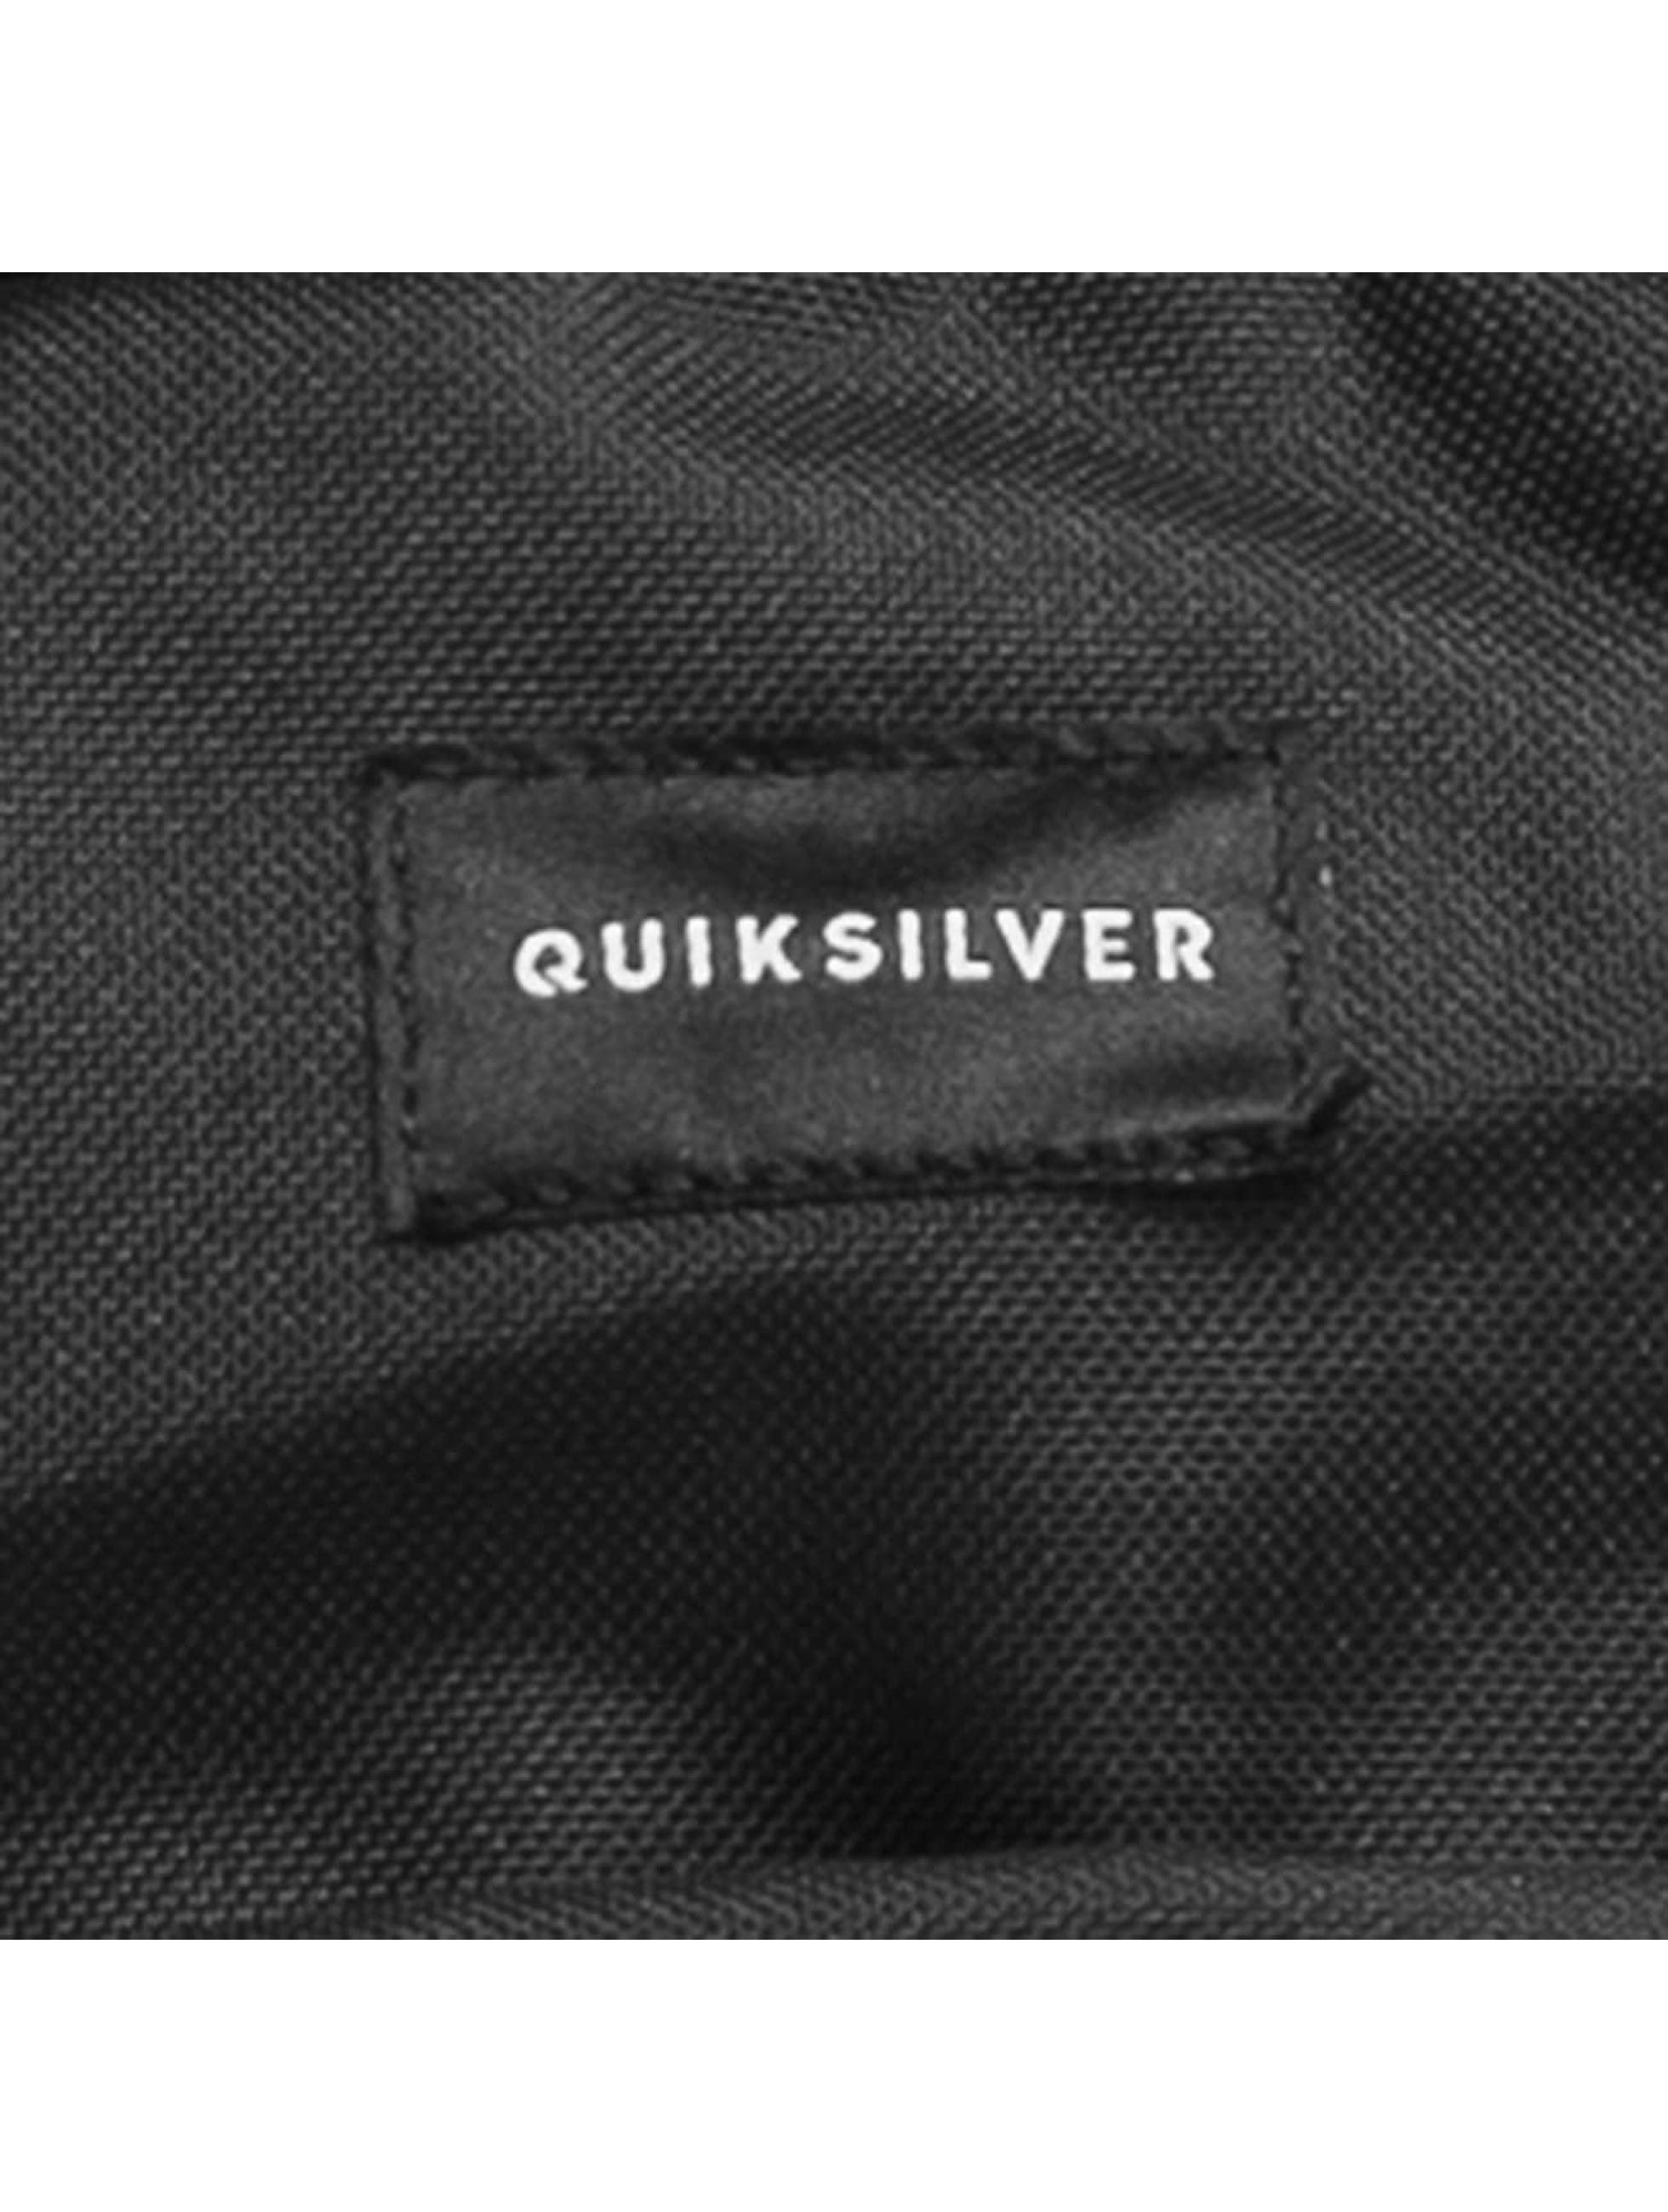 Quiksilver Rucksack Burst schwarz